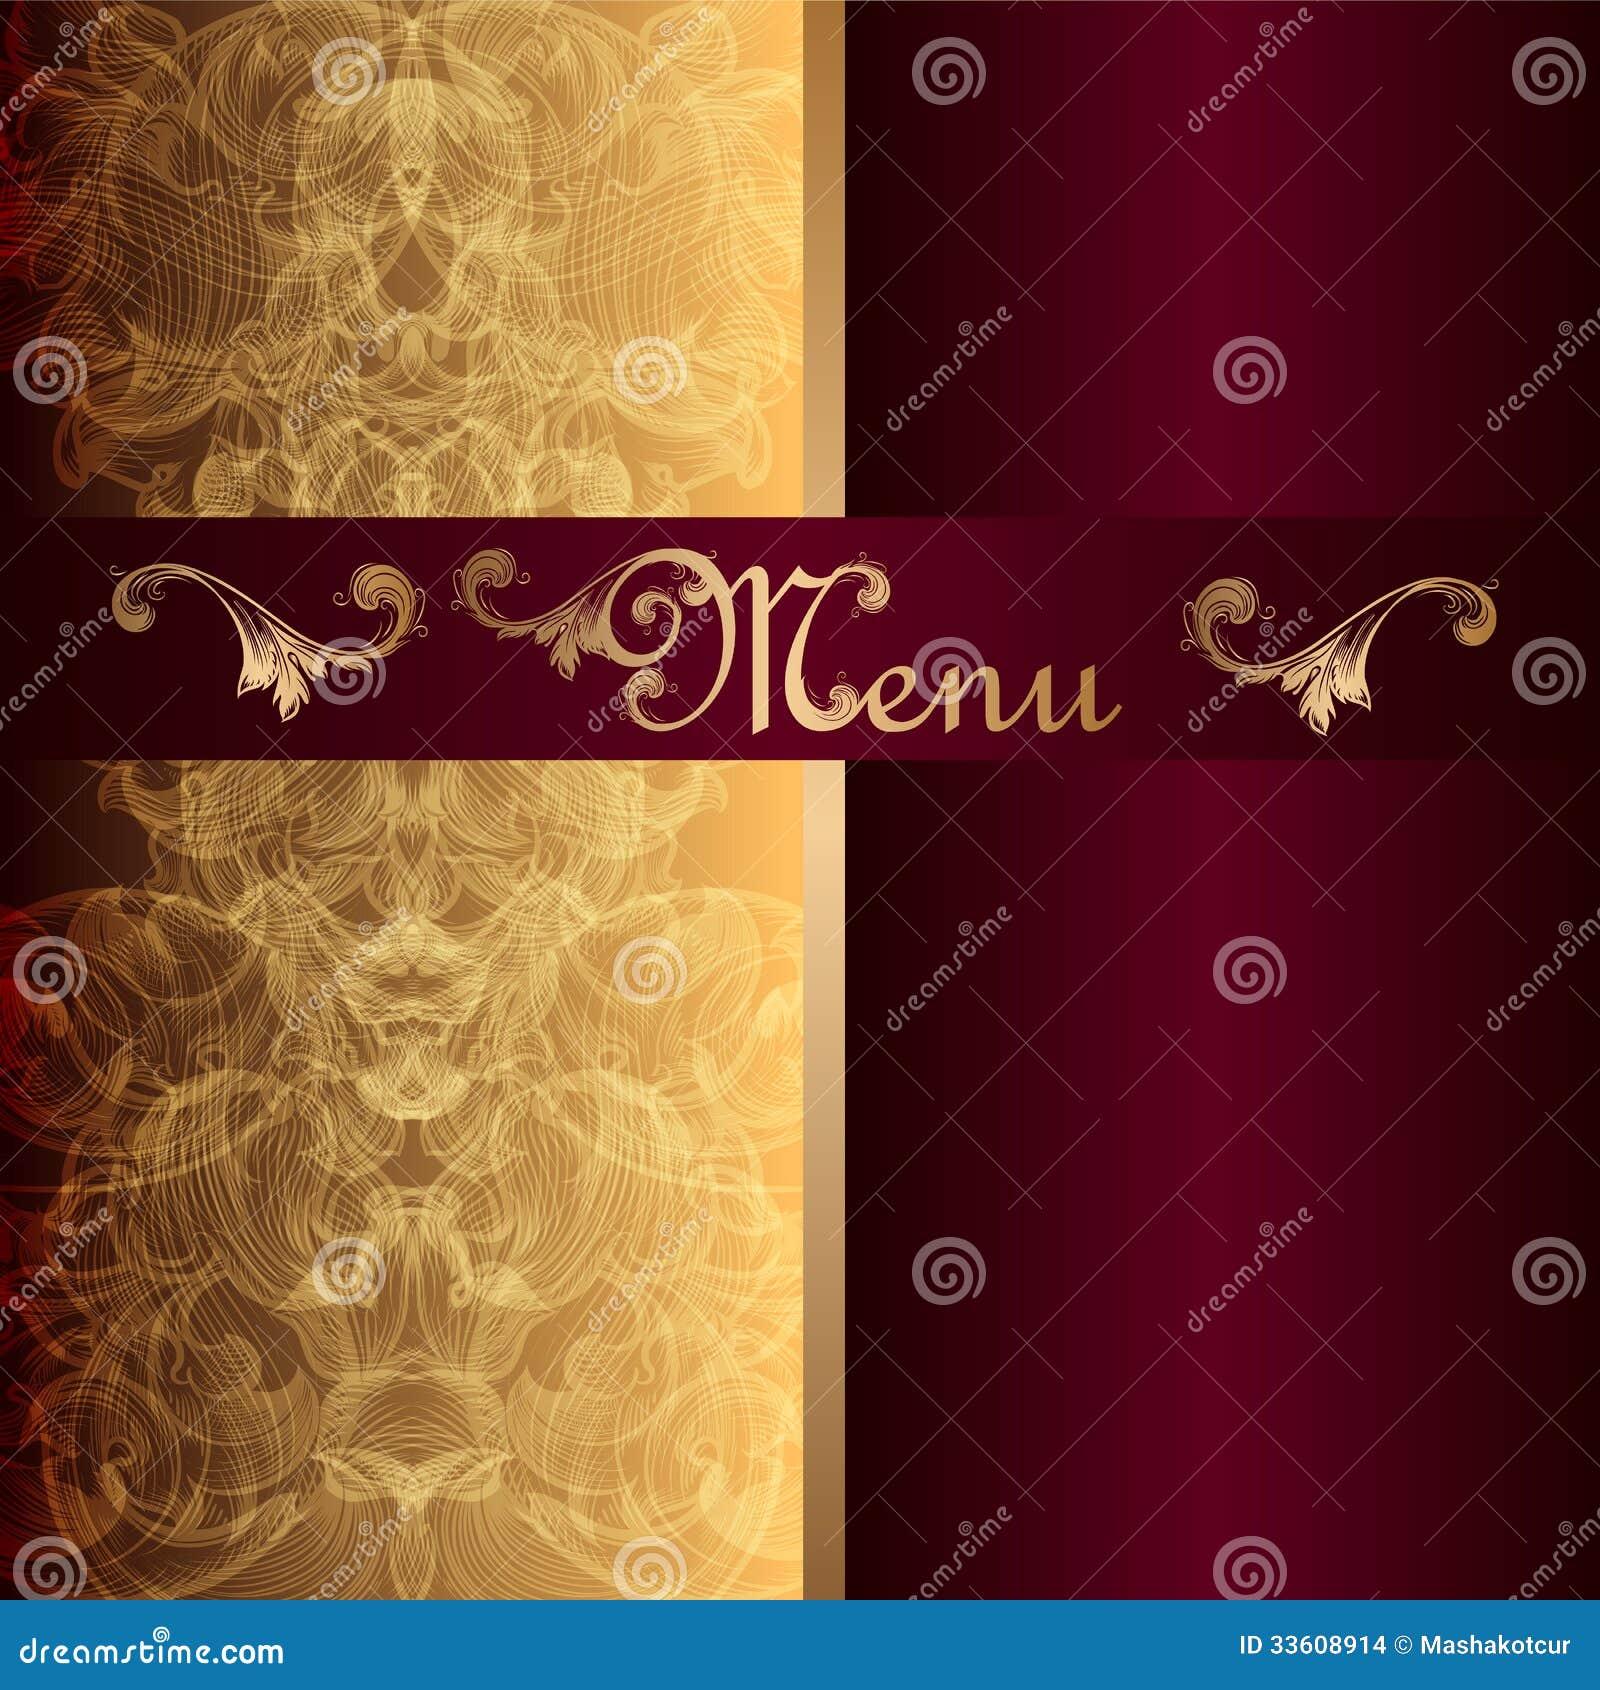 Luxury Menu Design In Vintage Style Stock Images - Image ...